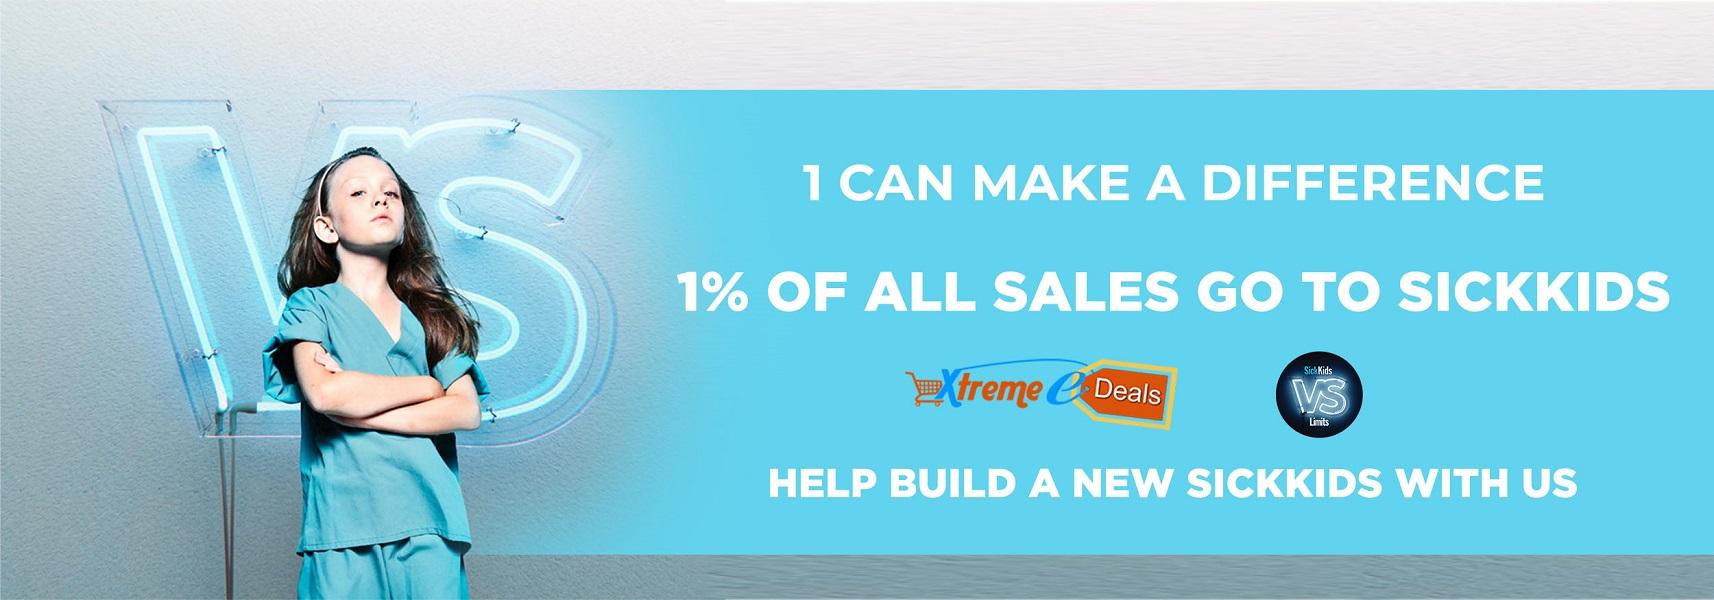 sickkids promotional banner - online retail store - xtreme edeals